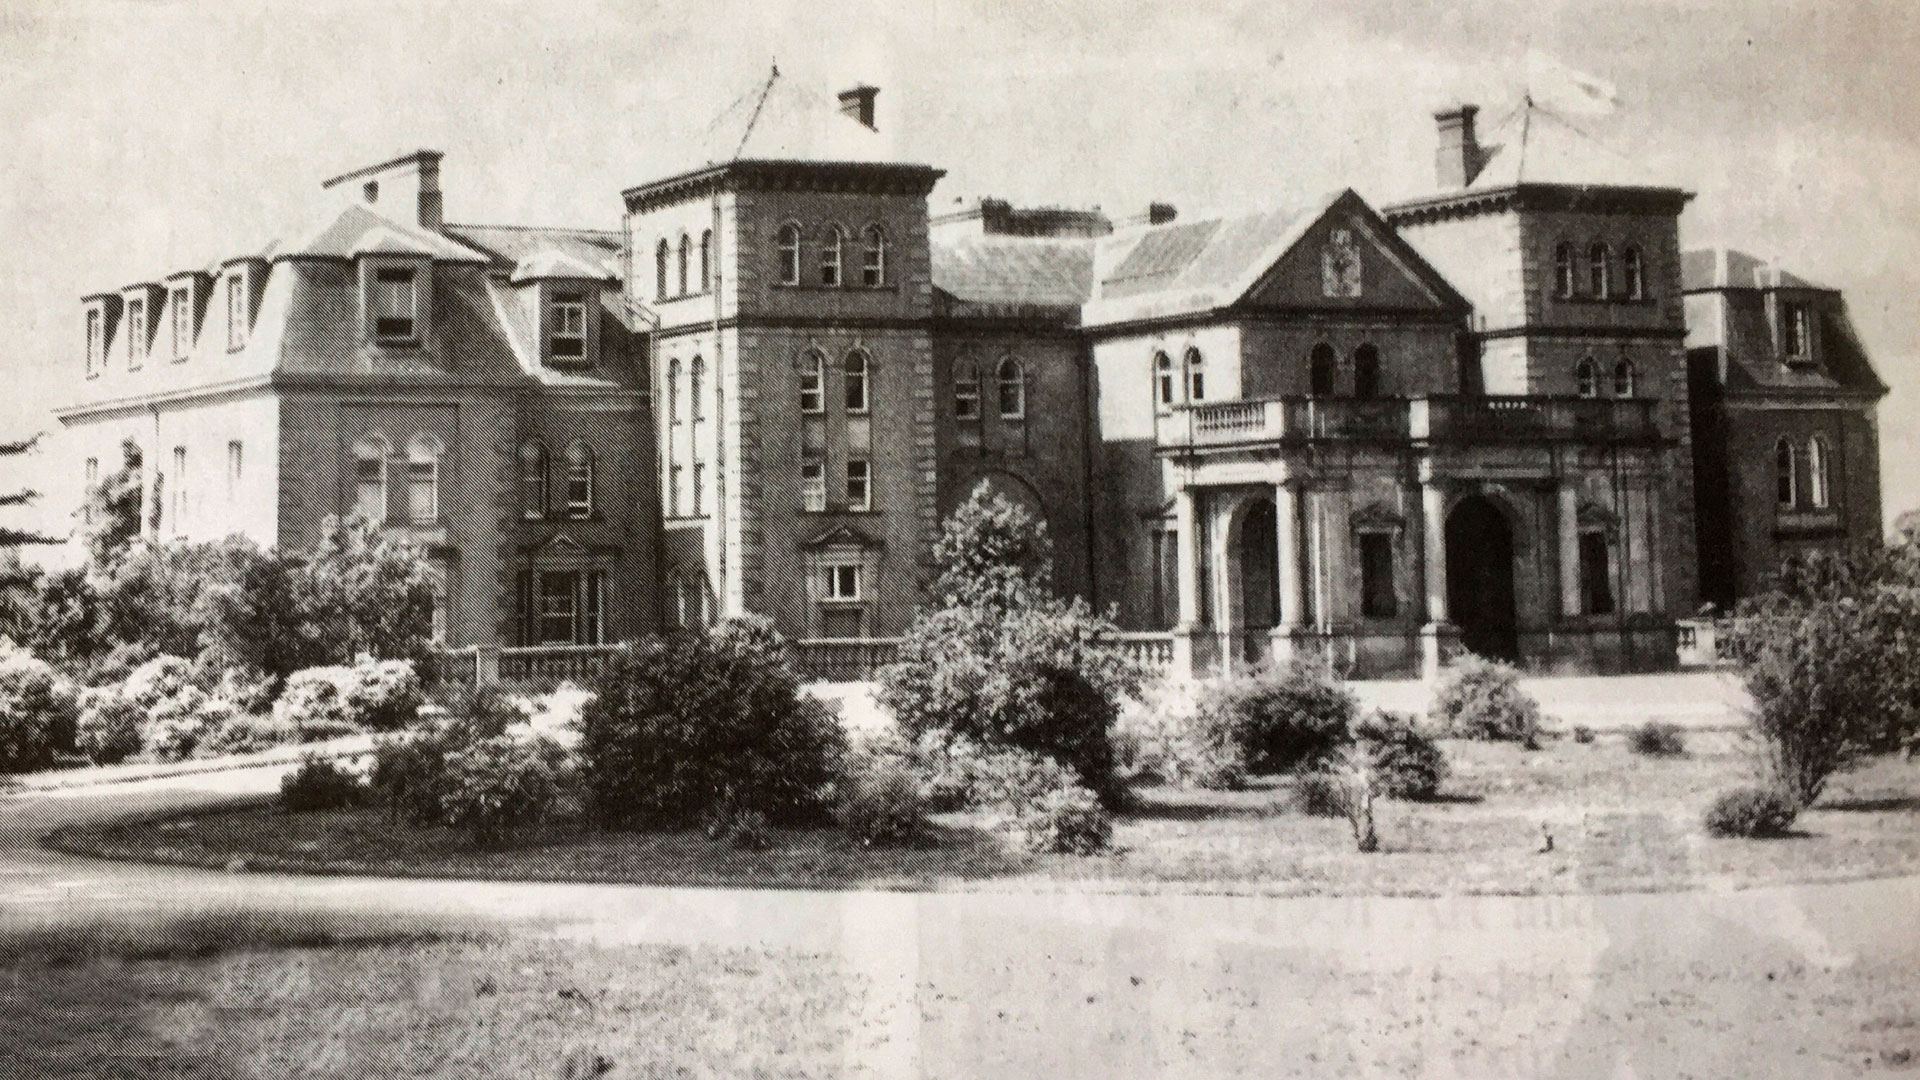 Heywood House Fire 1950